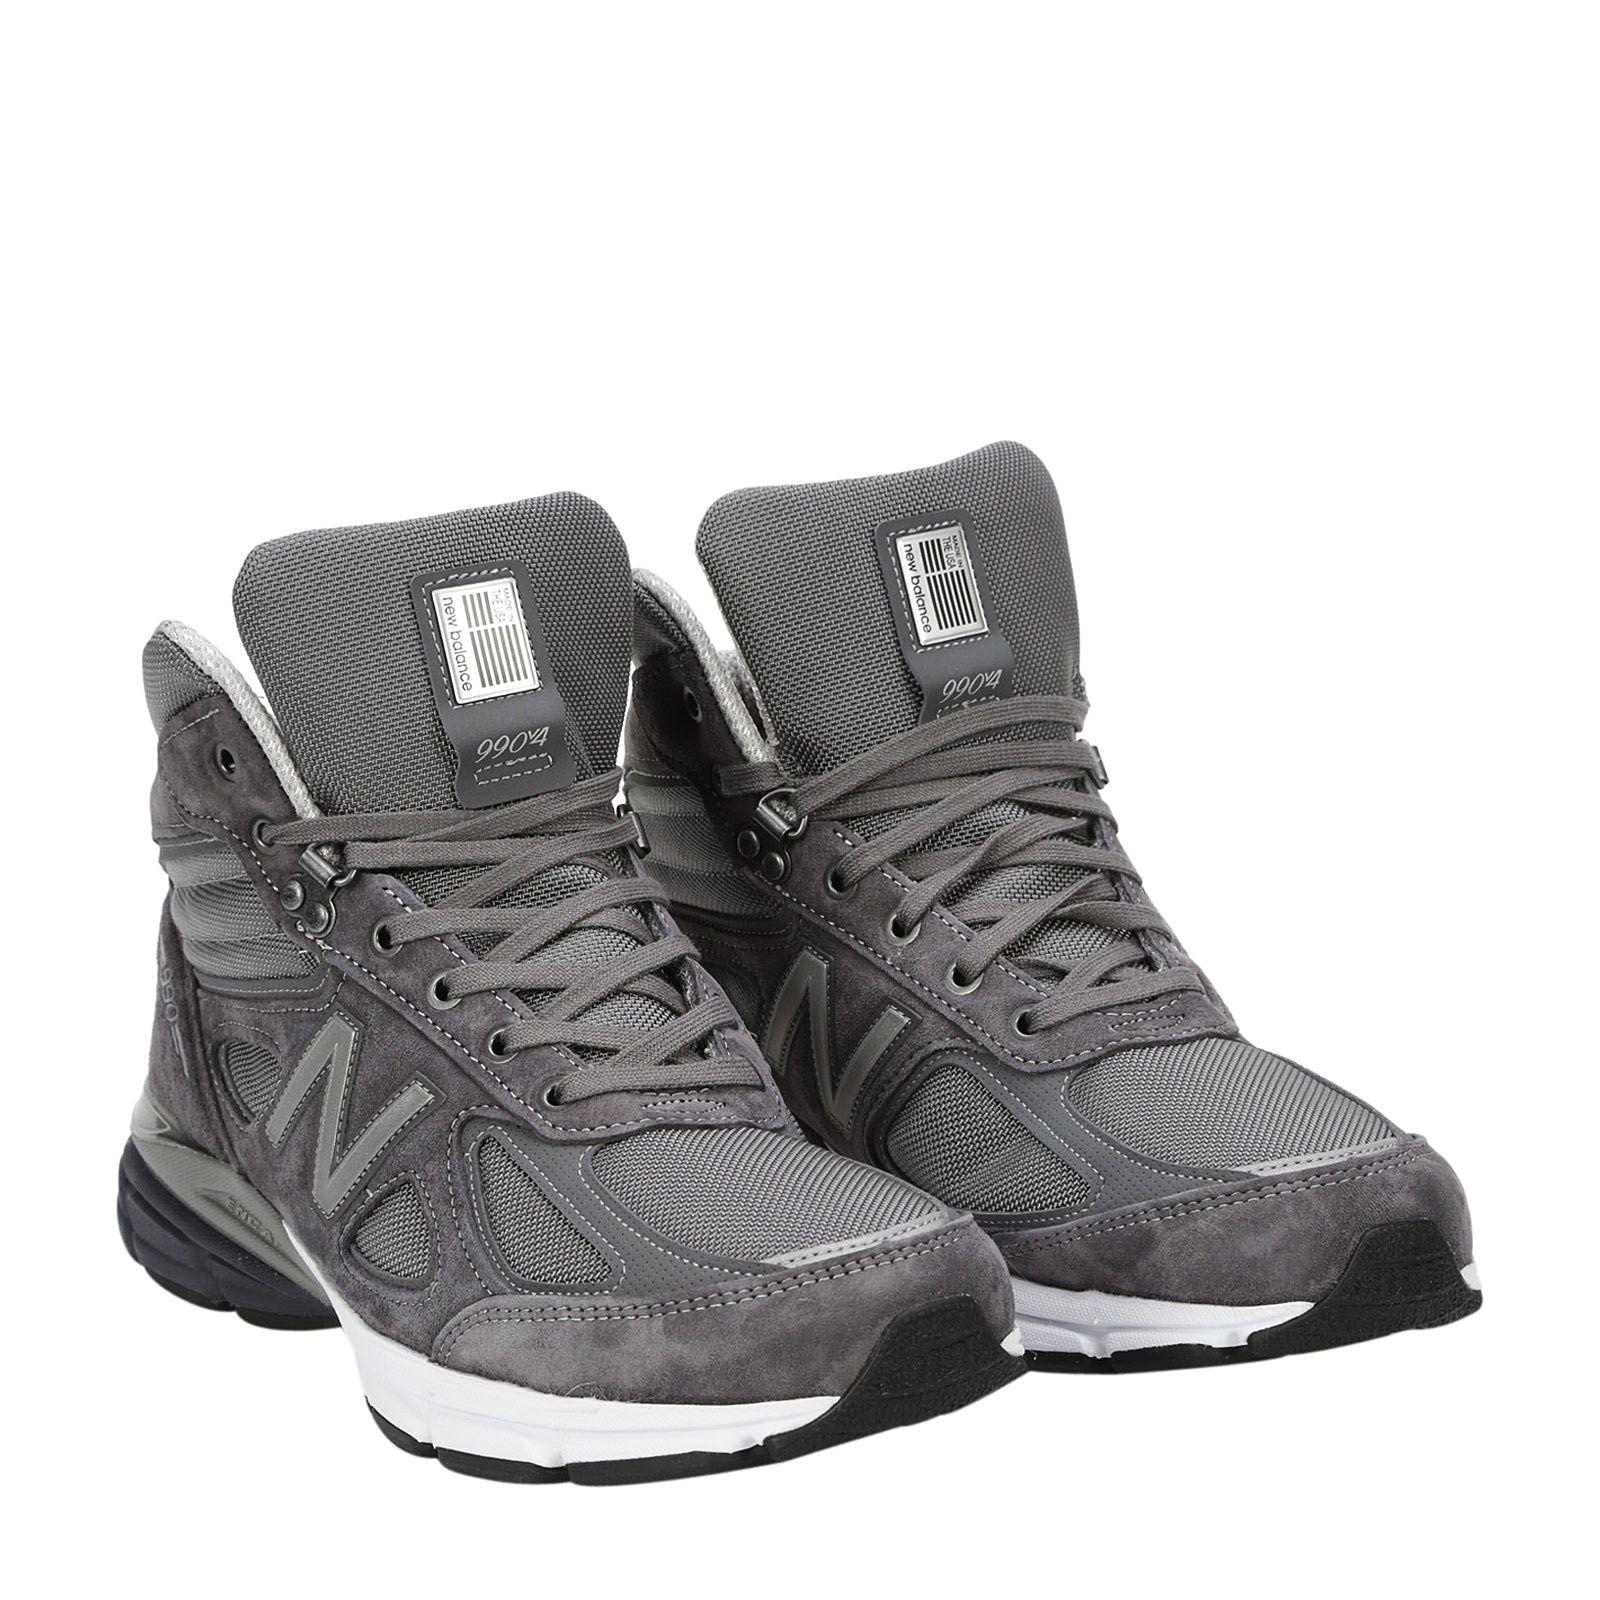 New Balance Hi-top Sneakers